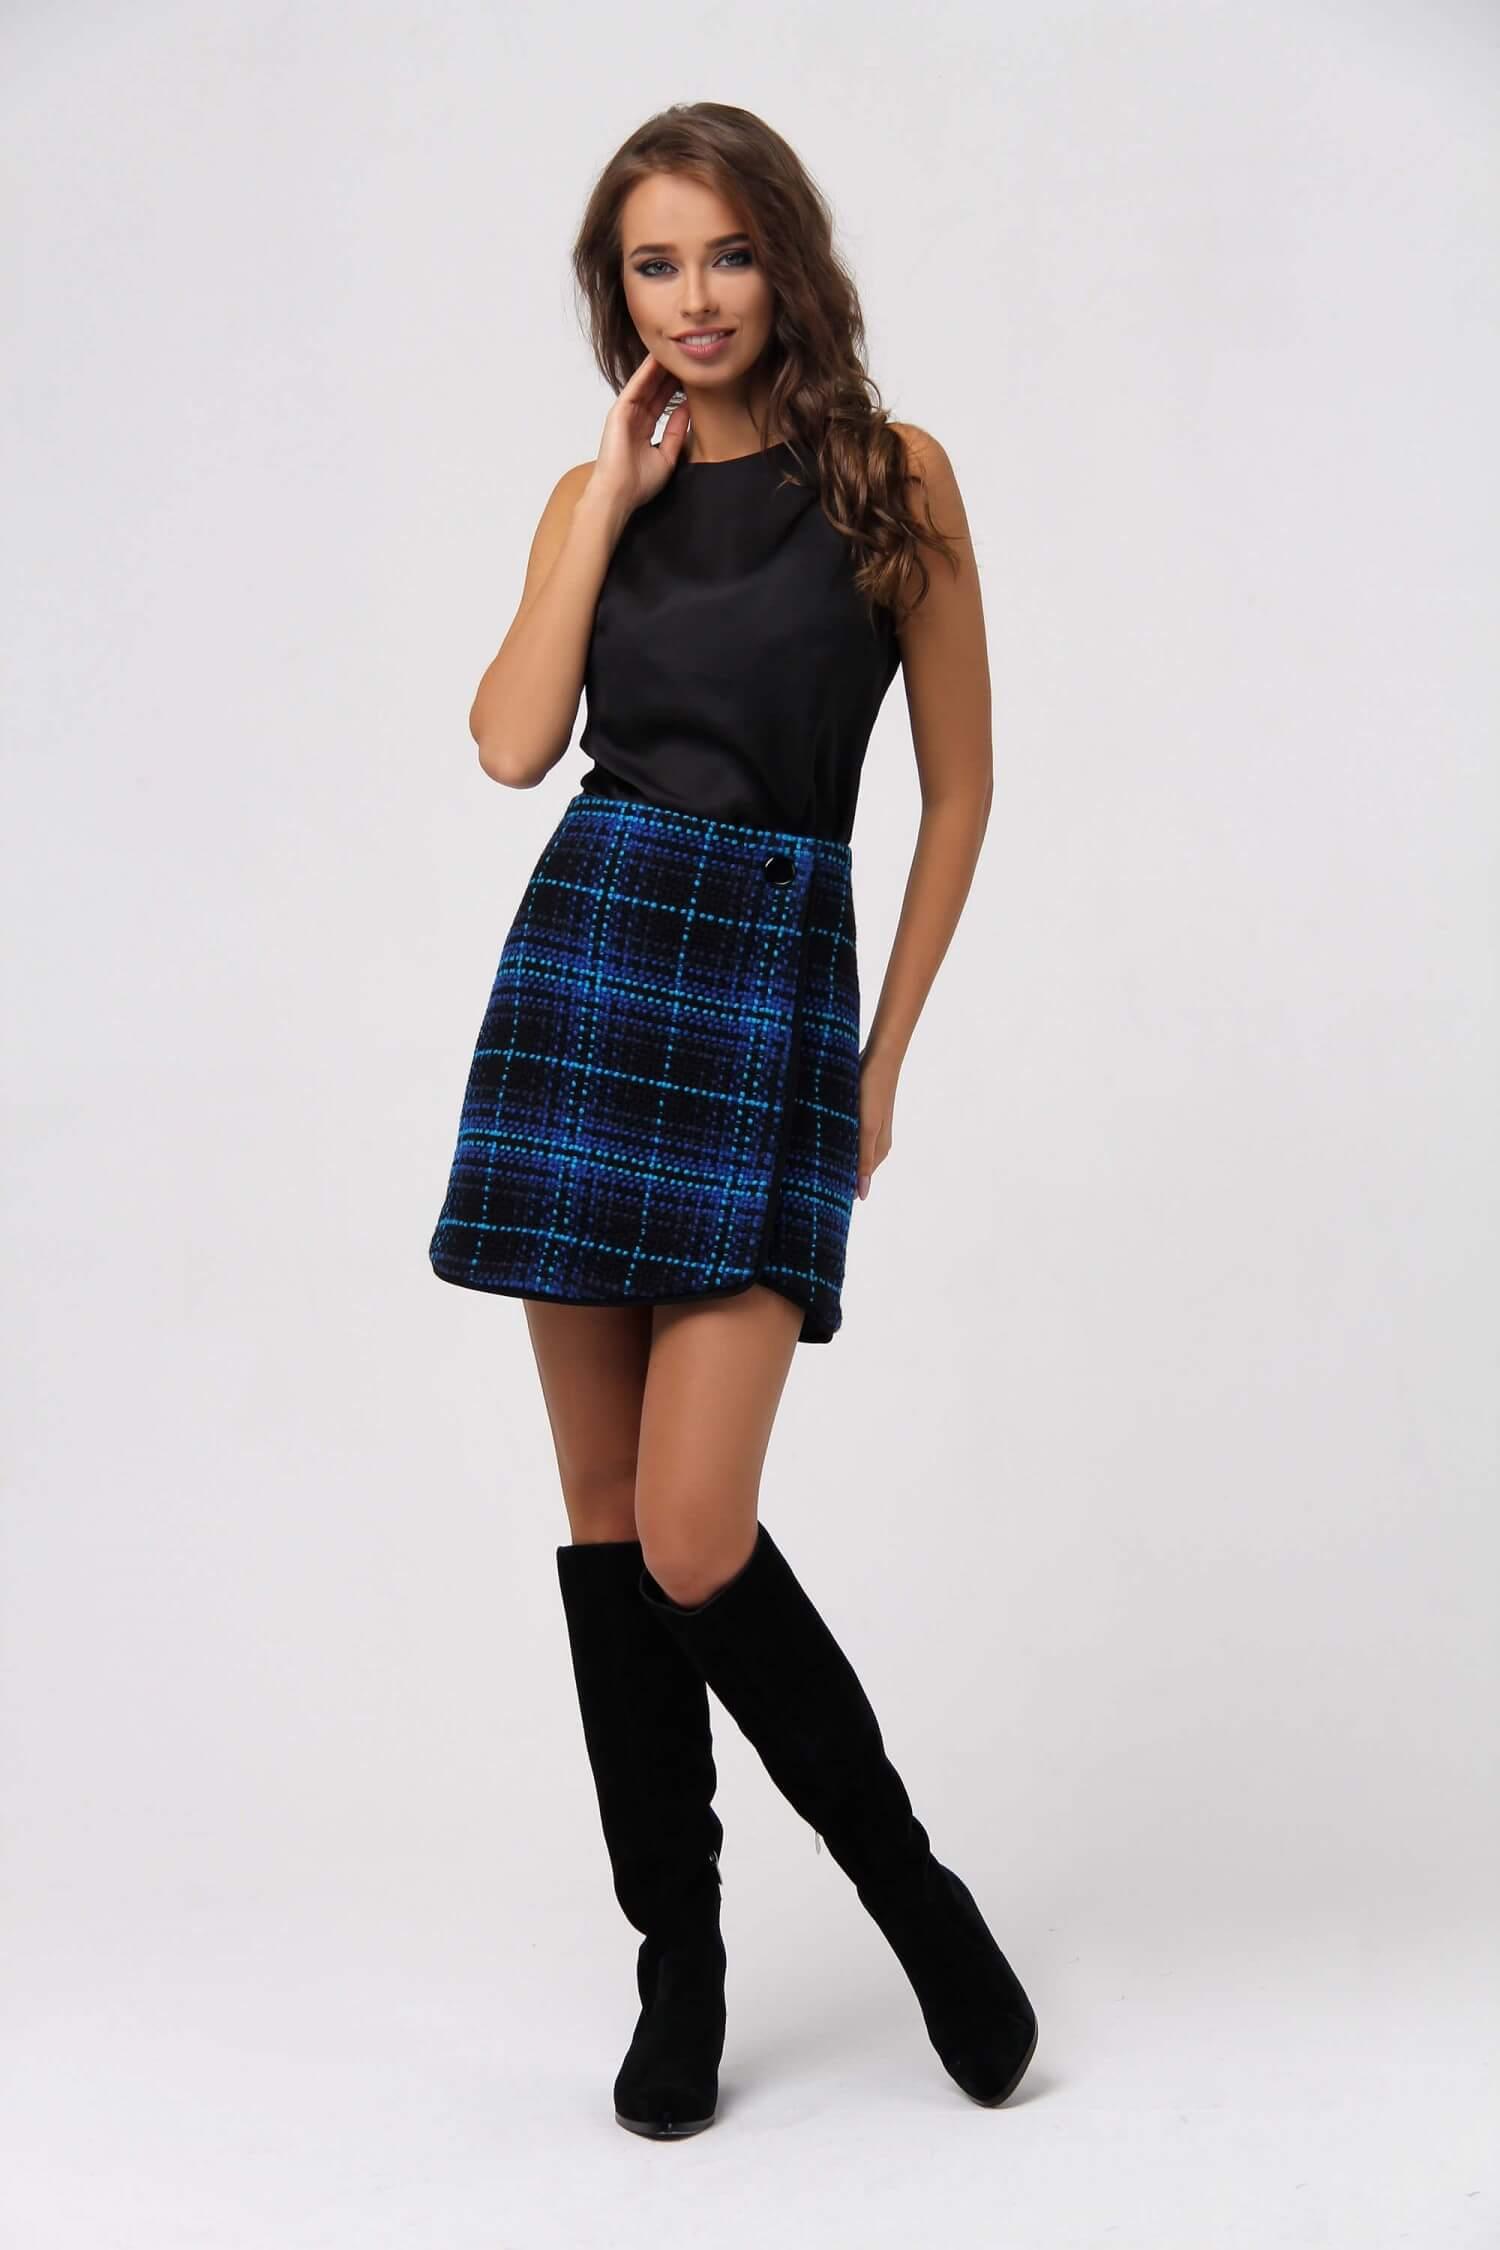 Фото картинка мини юбка